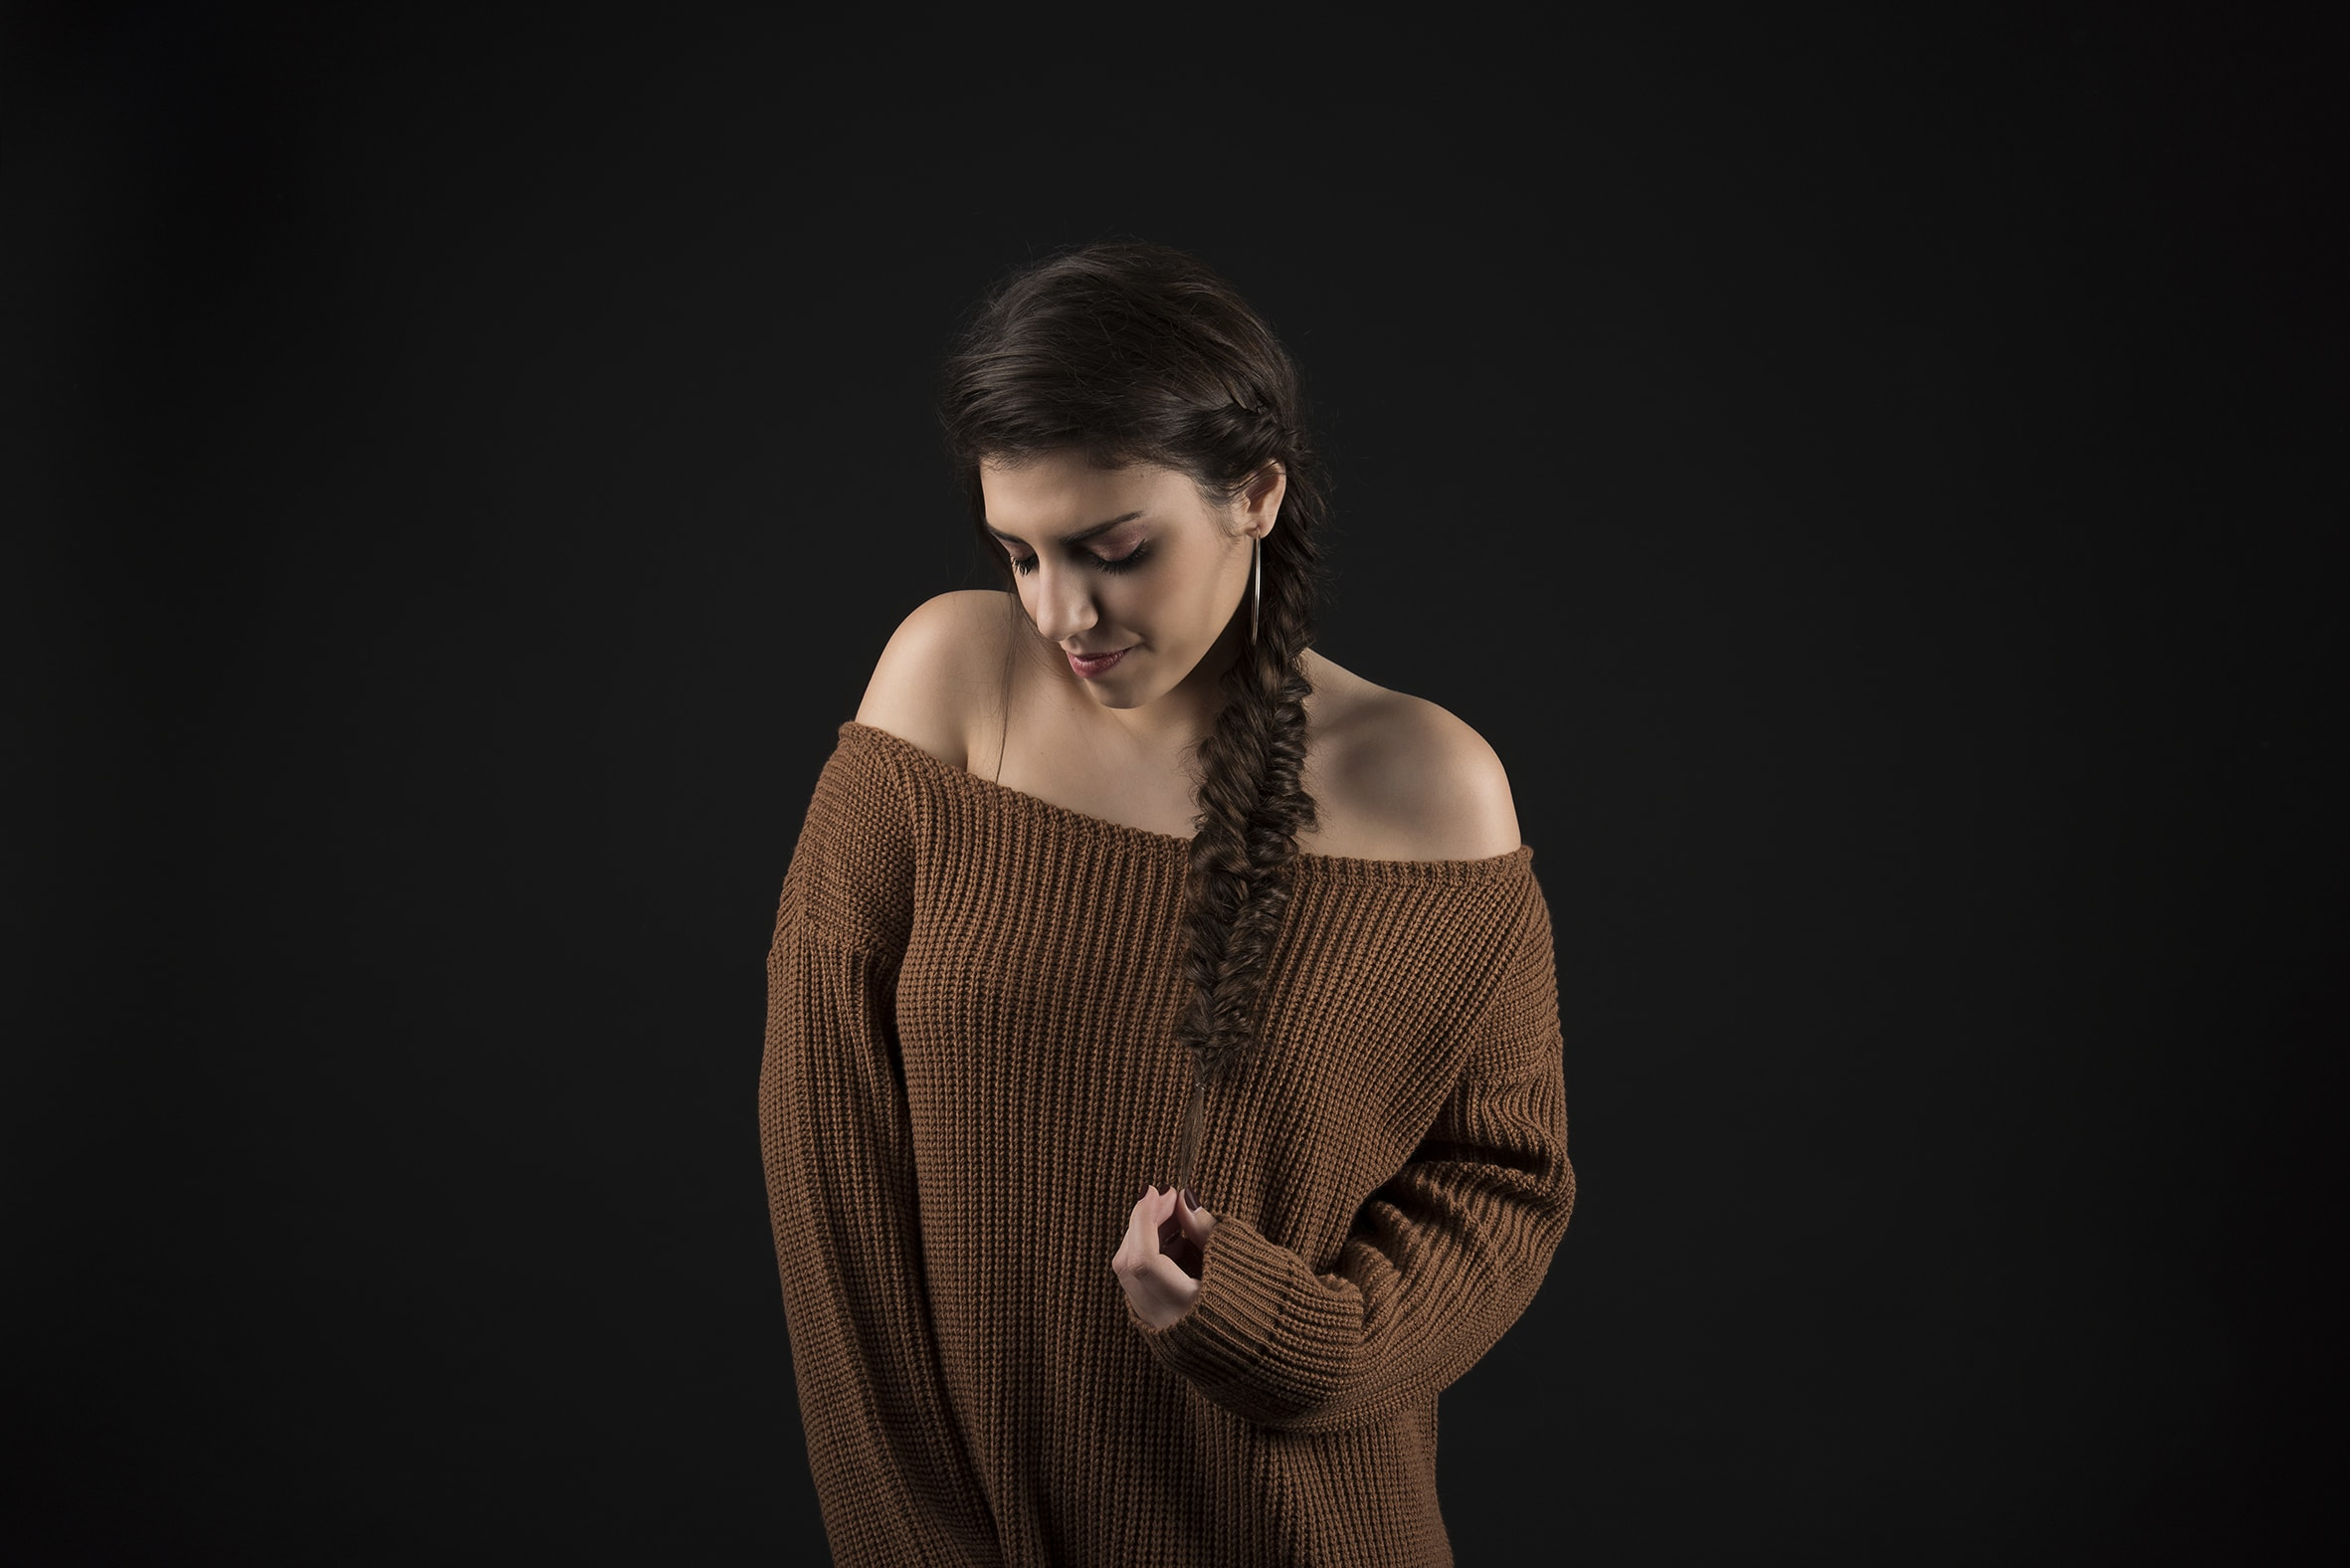 shooting-photo-lausanne-studio-professionnel-femme-model-maquillage-coiffure-tresse-pull-retouche